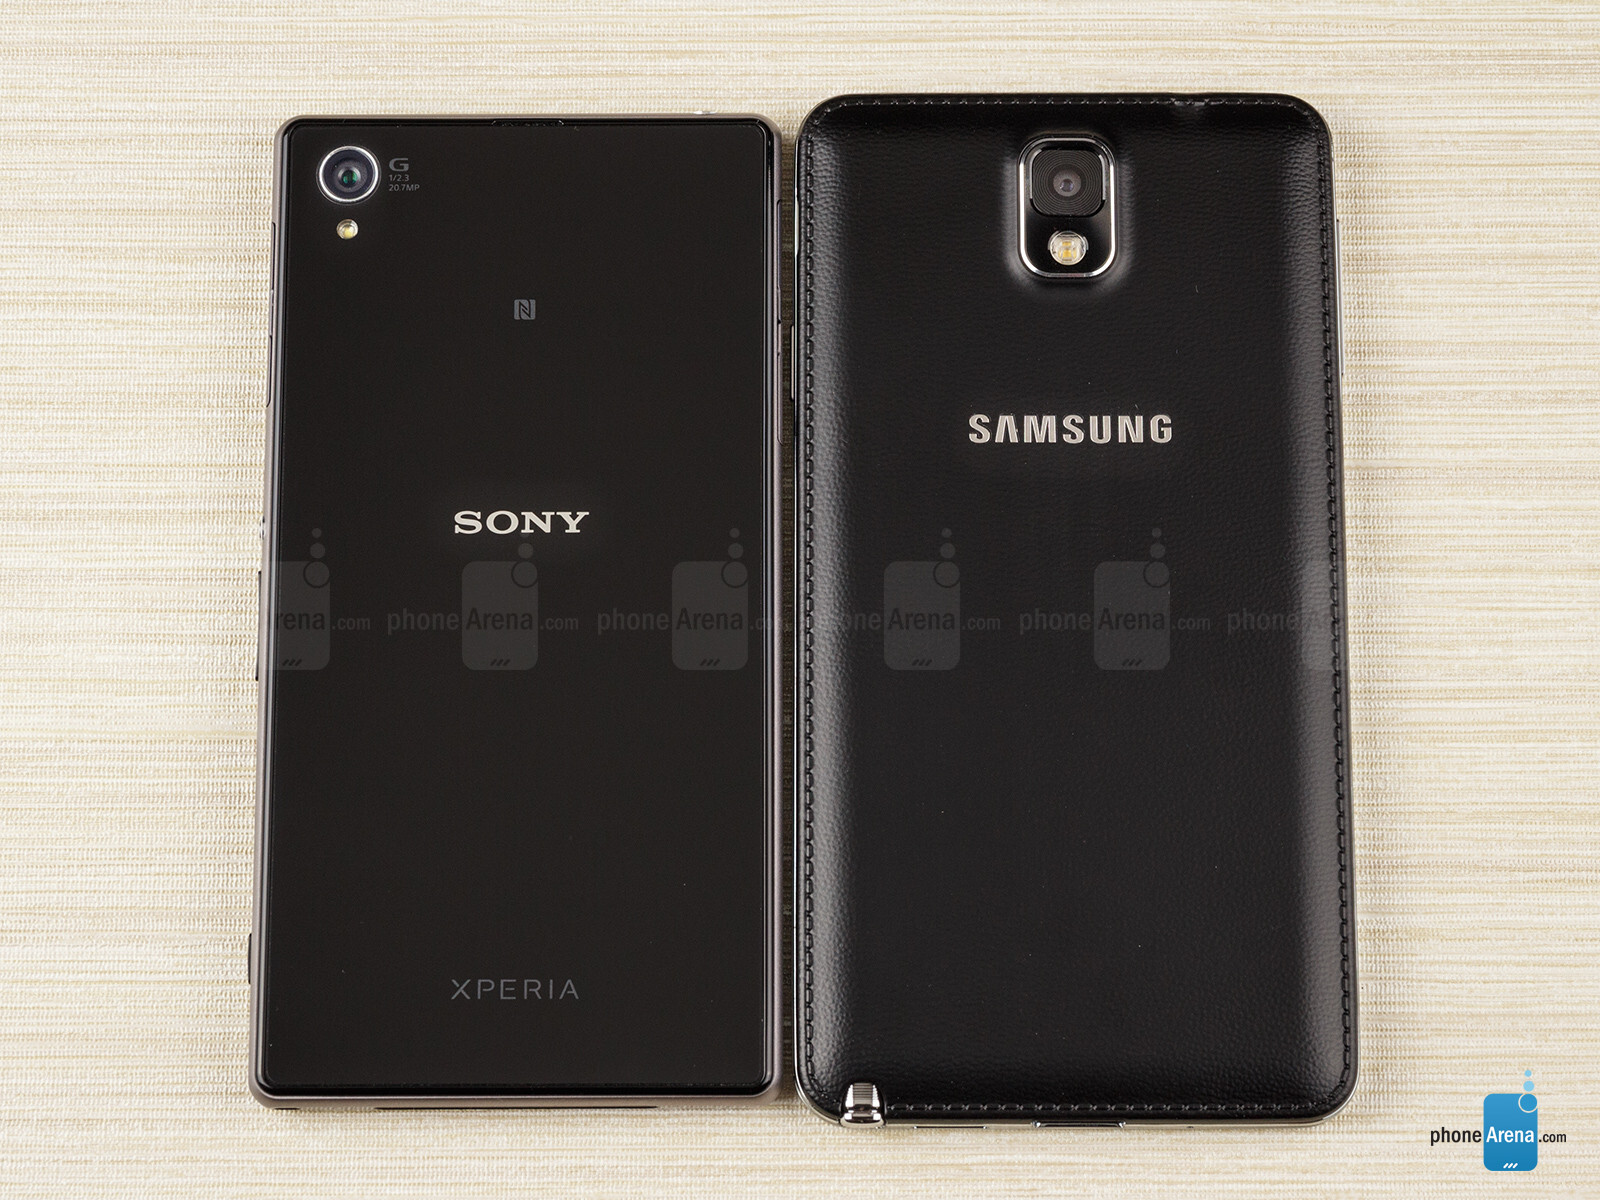 Samsung Galaxy Note 3 vs Sony Xperia Z1 {Source:- PhoneArena}